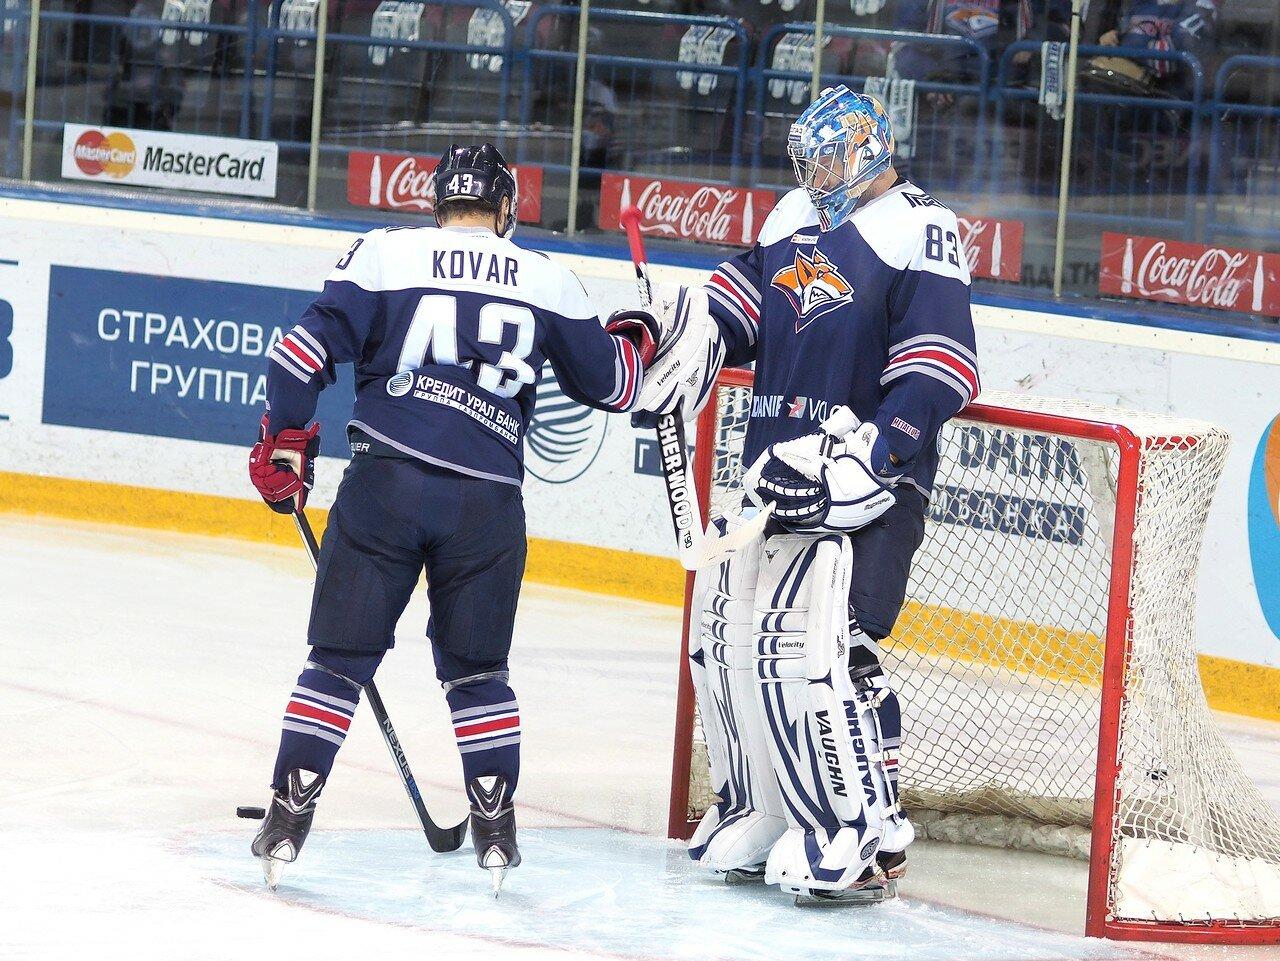 24Восток 1/2 плей-офф Металлург - Сибирь 08.03.2016